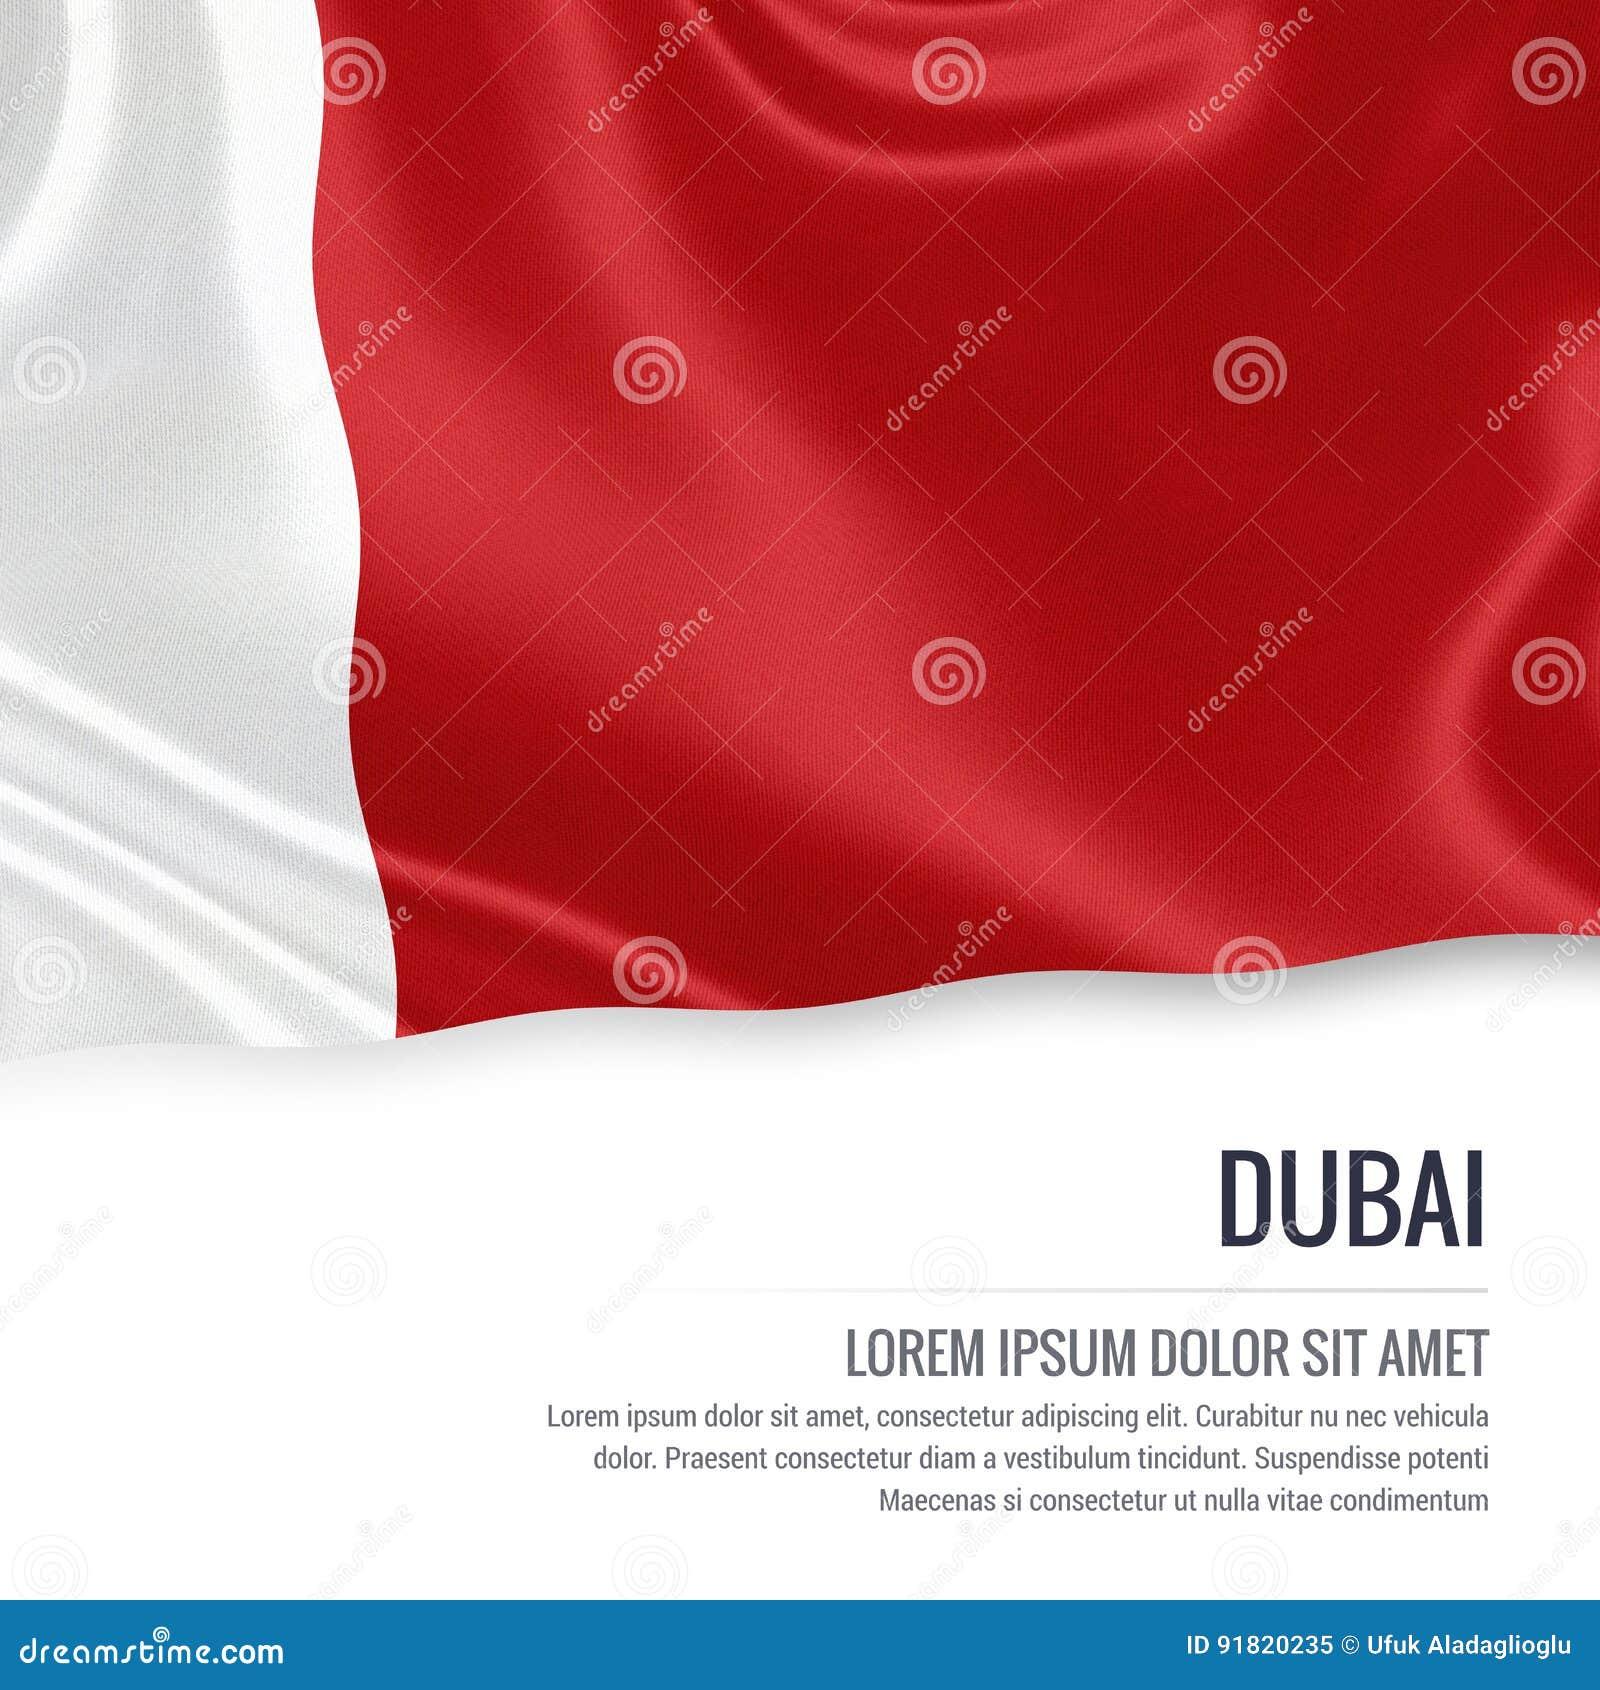 The United Arab Emirates State Dubai Flag Stock Illustration